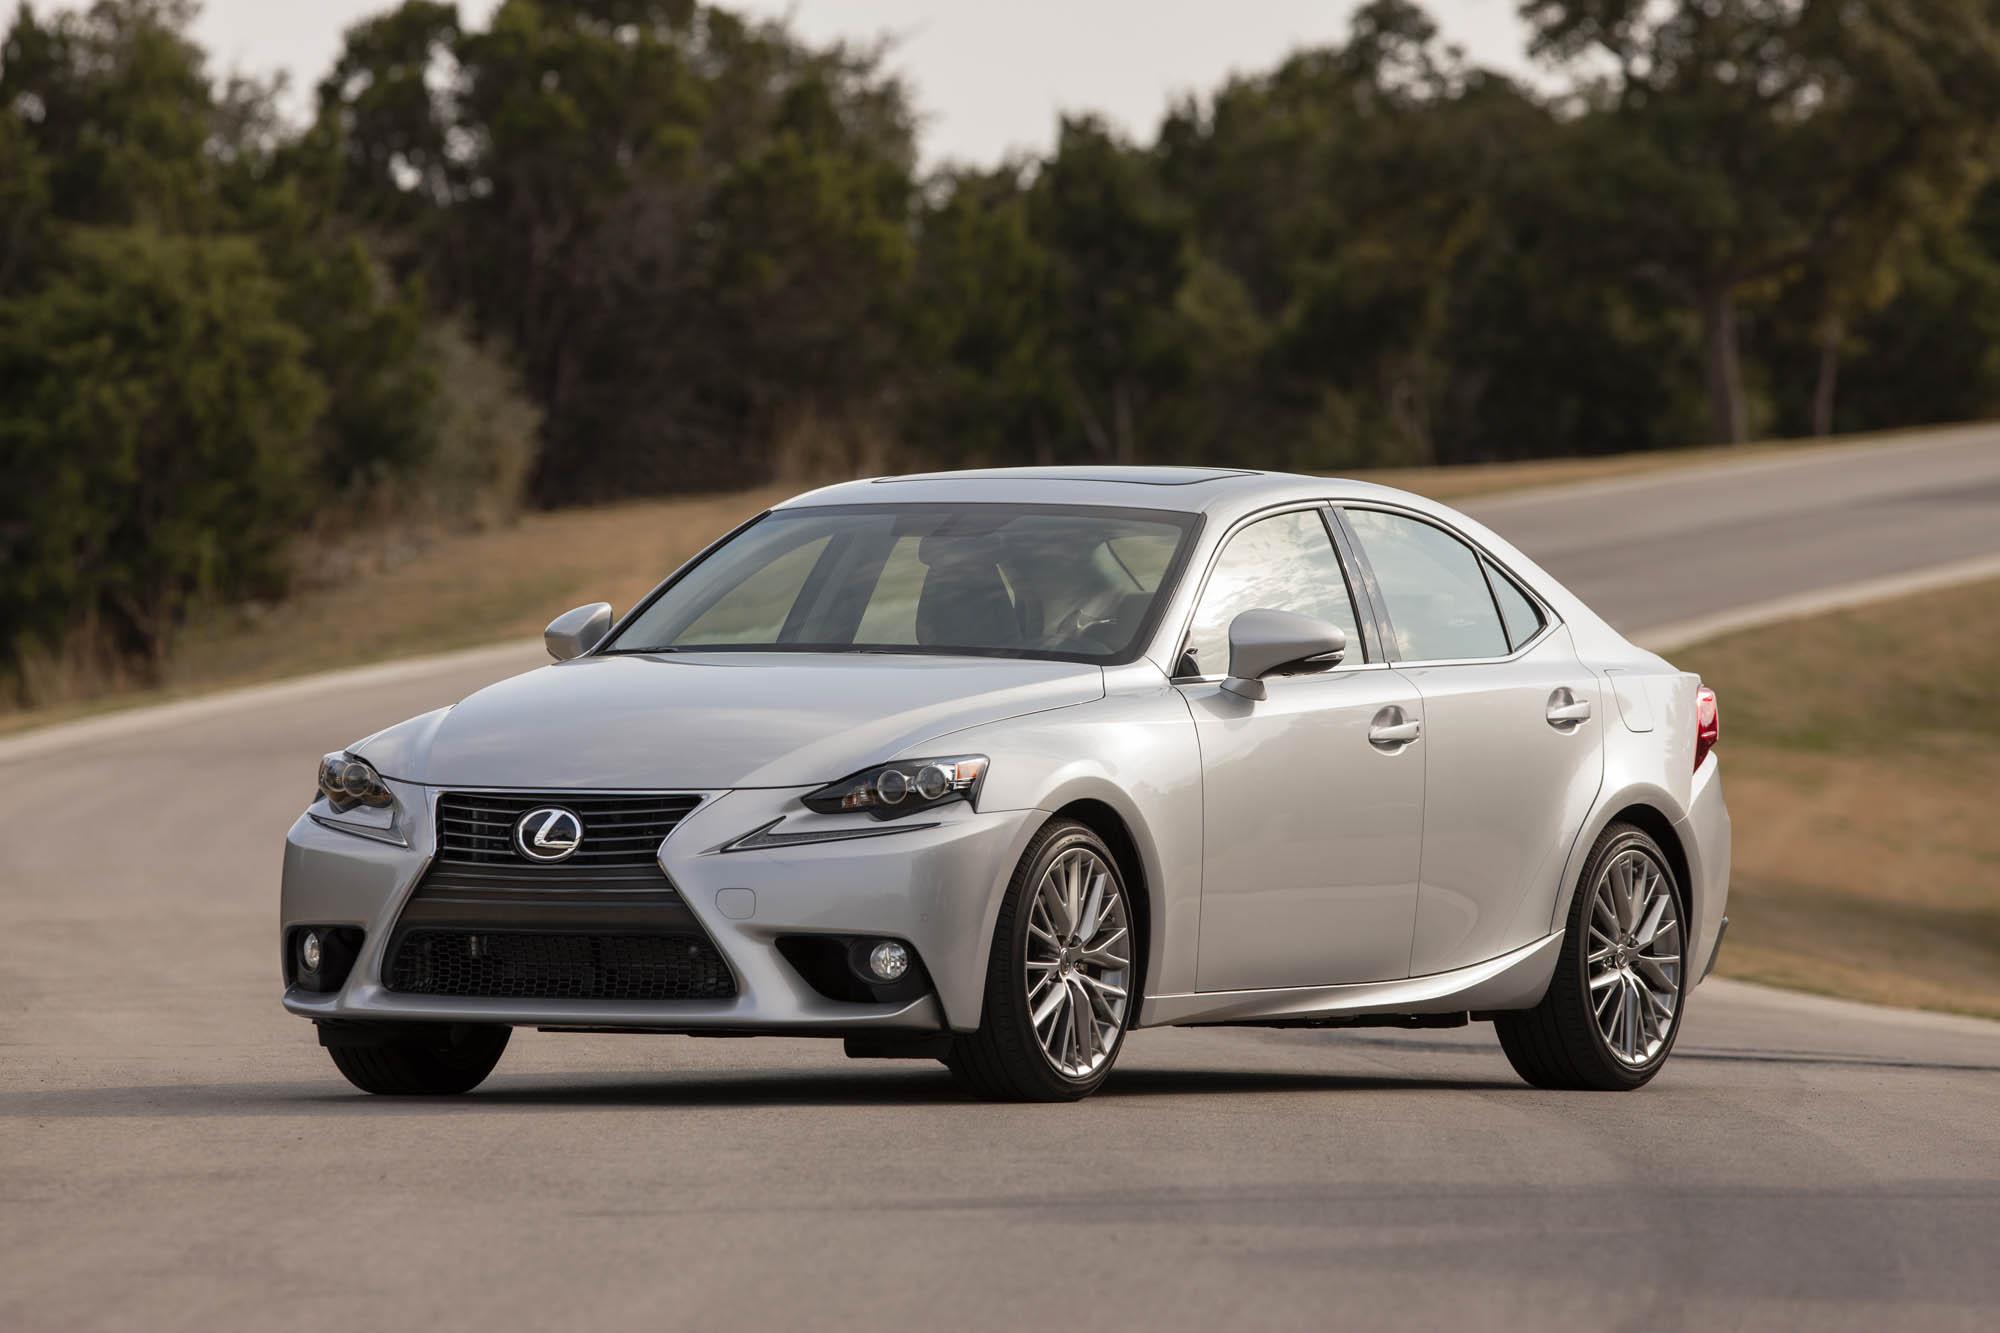 2014 Lexus IS Earns NHTSA Five Star Crash Rating